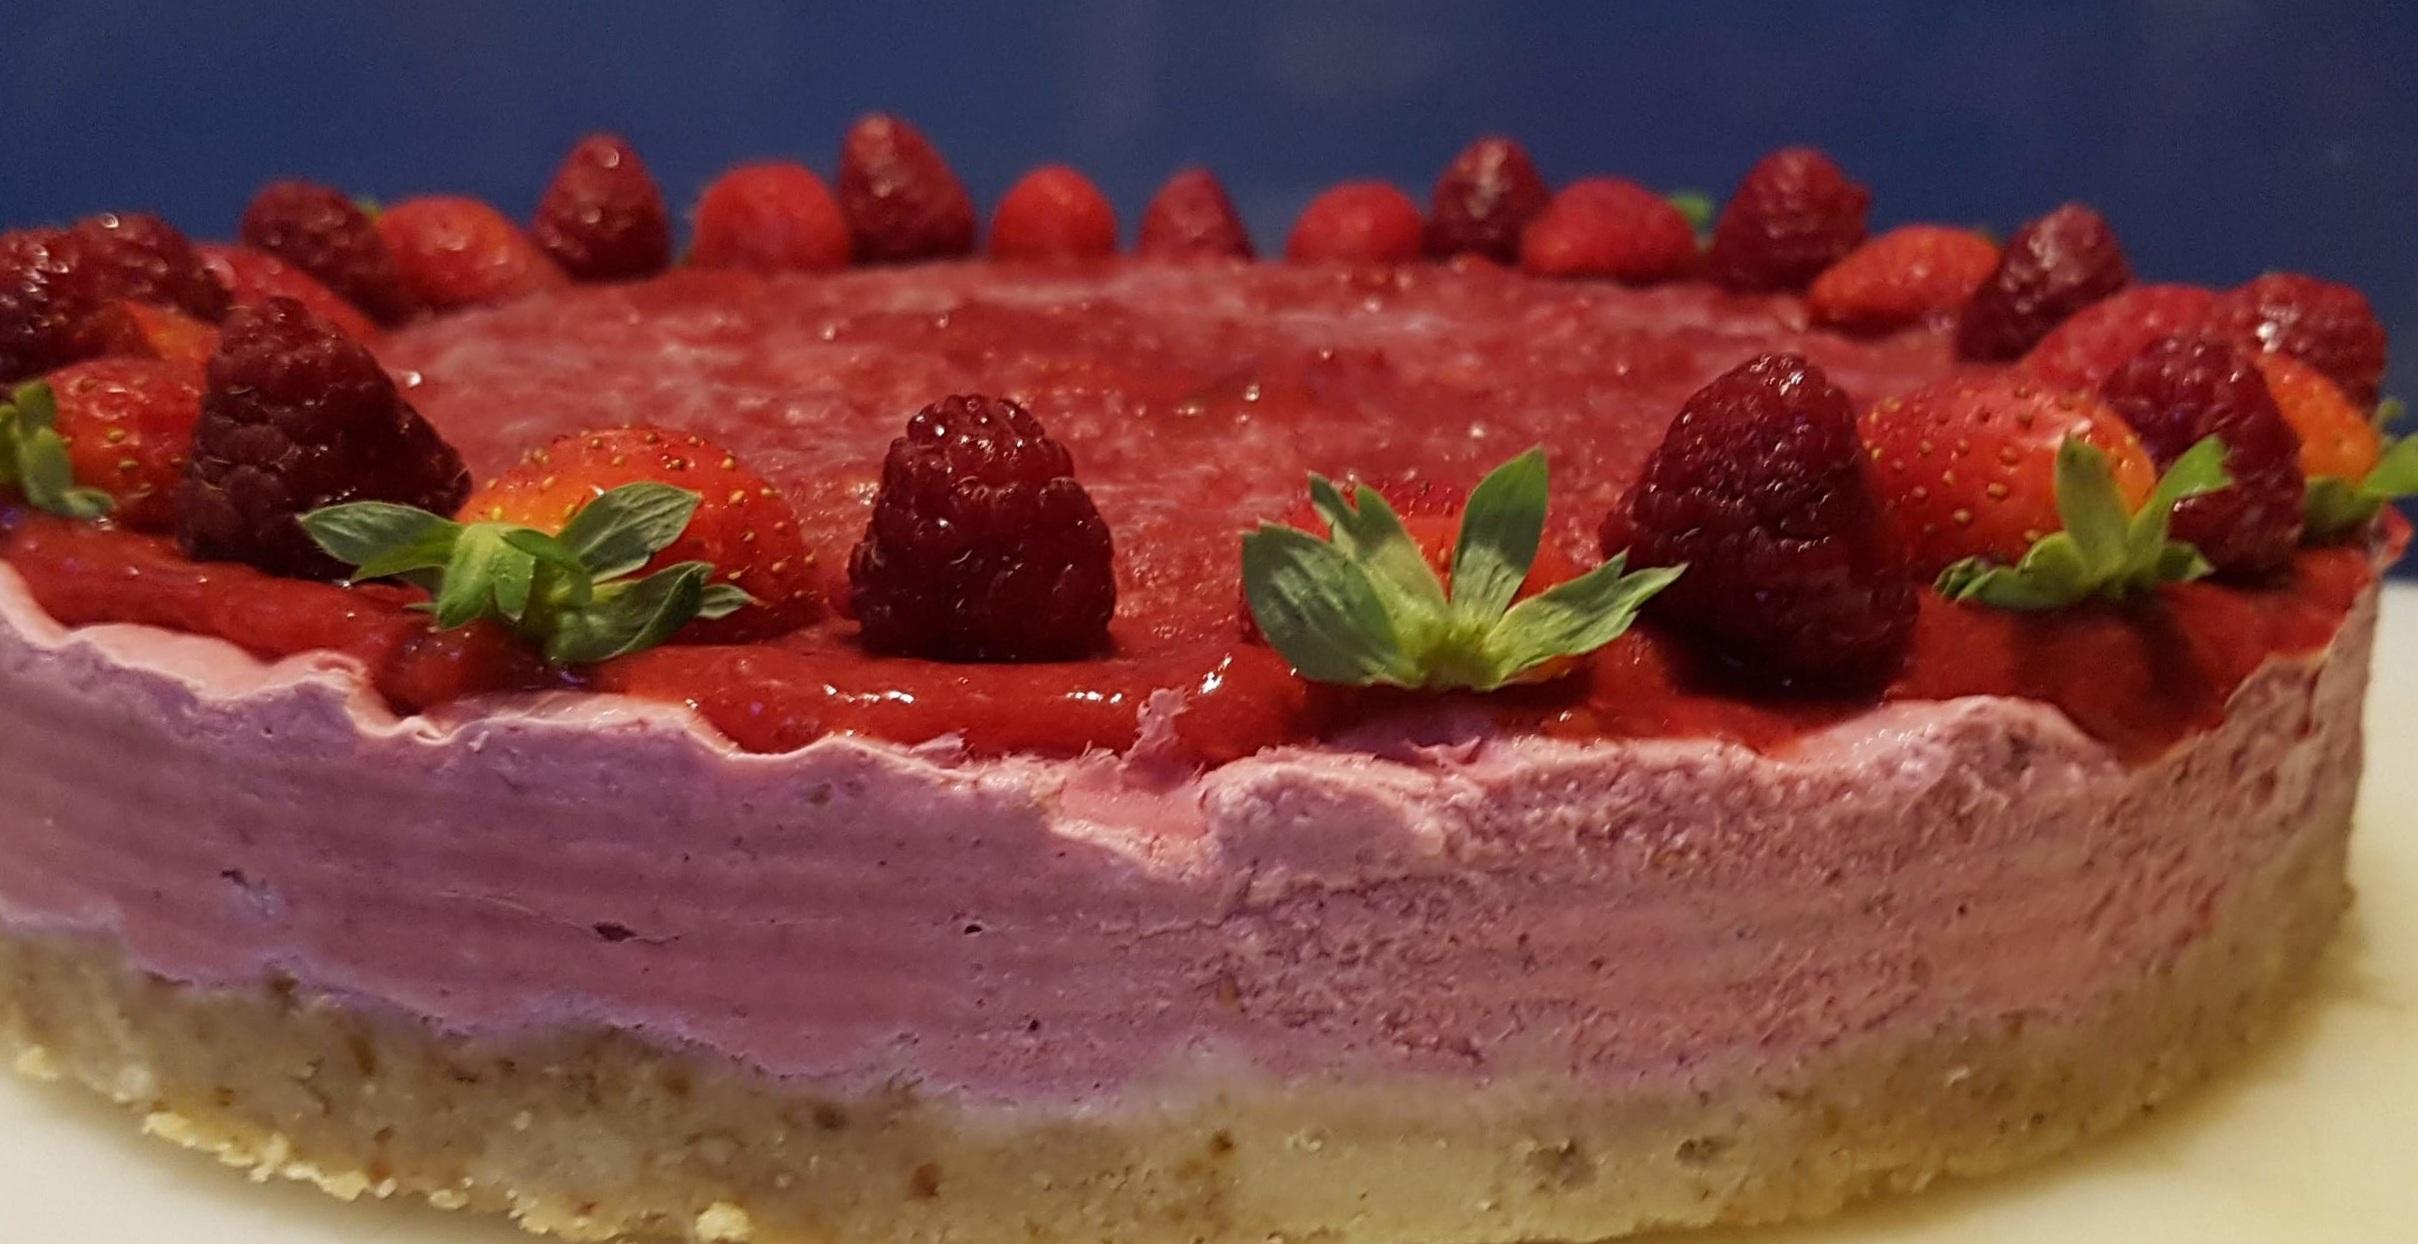 D E L I C I O U S Frozen red berry cake - one of our vegan and gluten free options